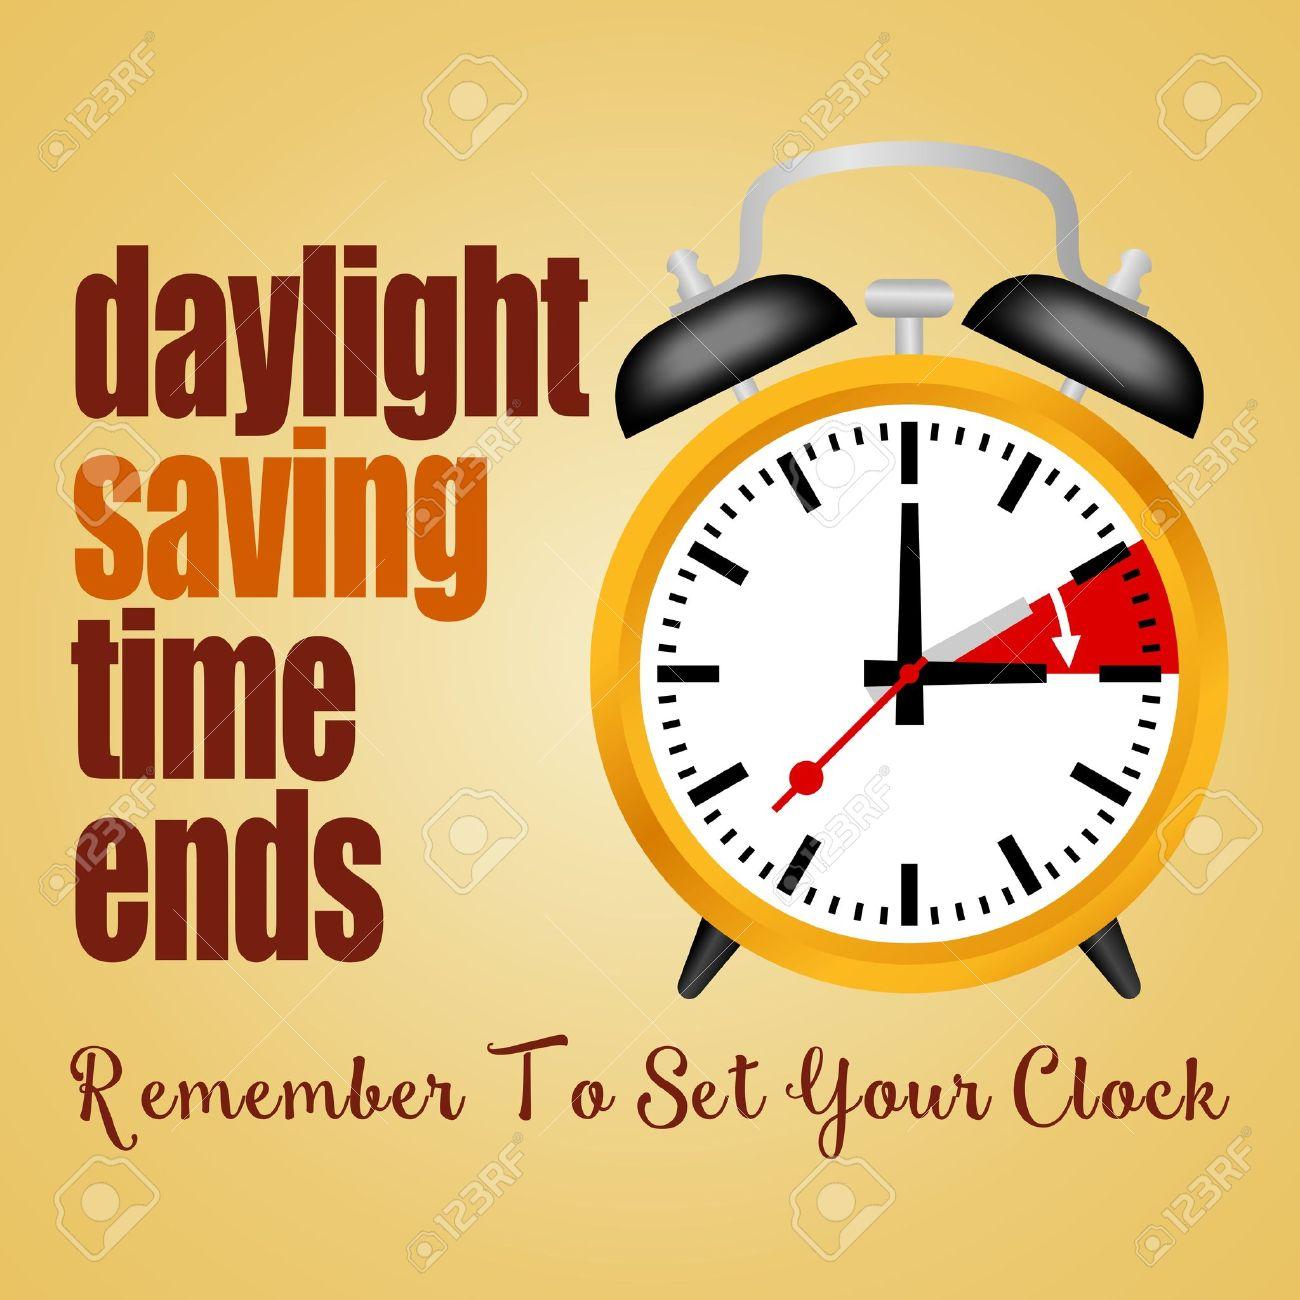 Daylight Savings Time Stock Photos And Images 123rf